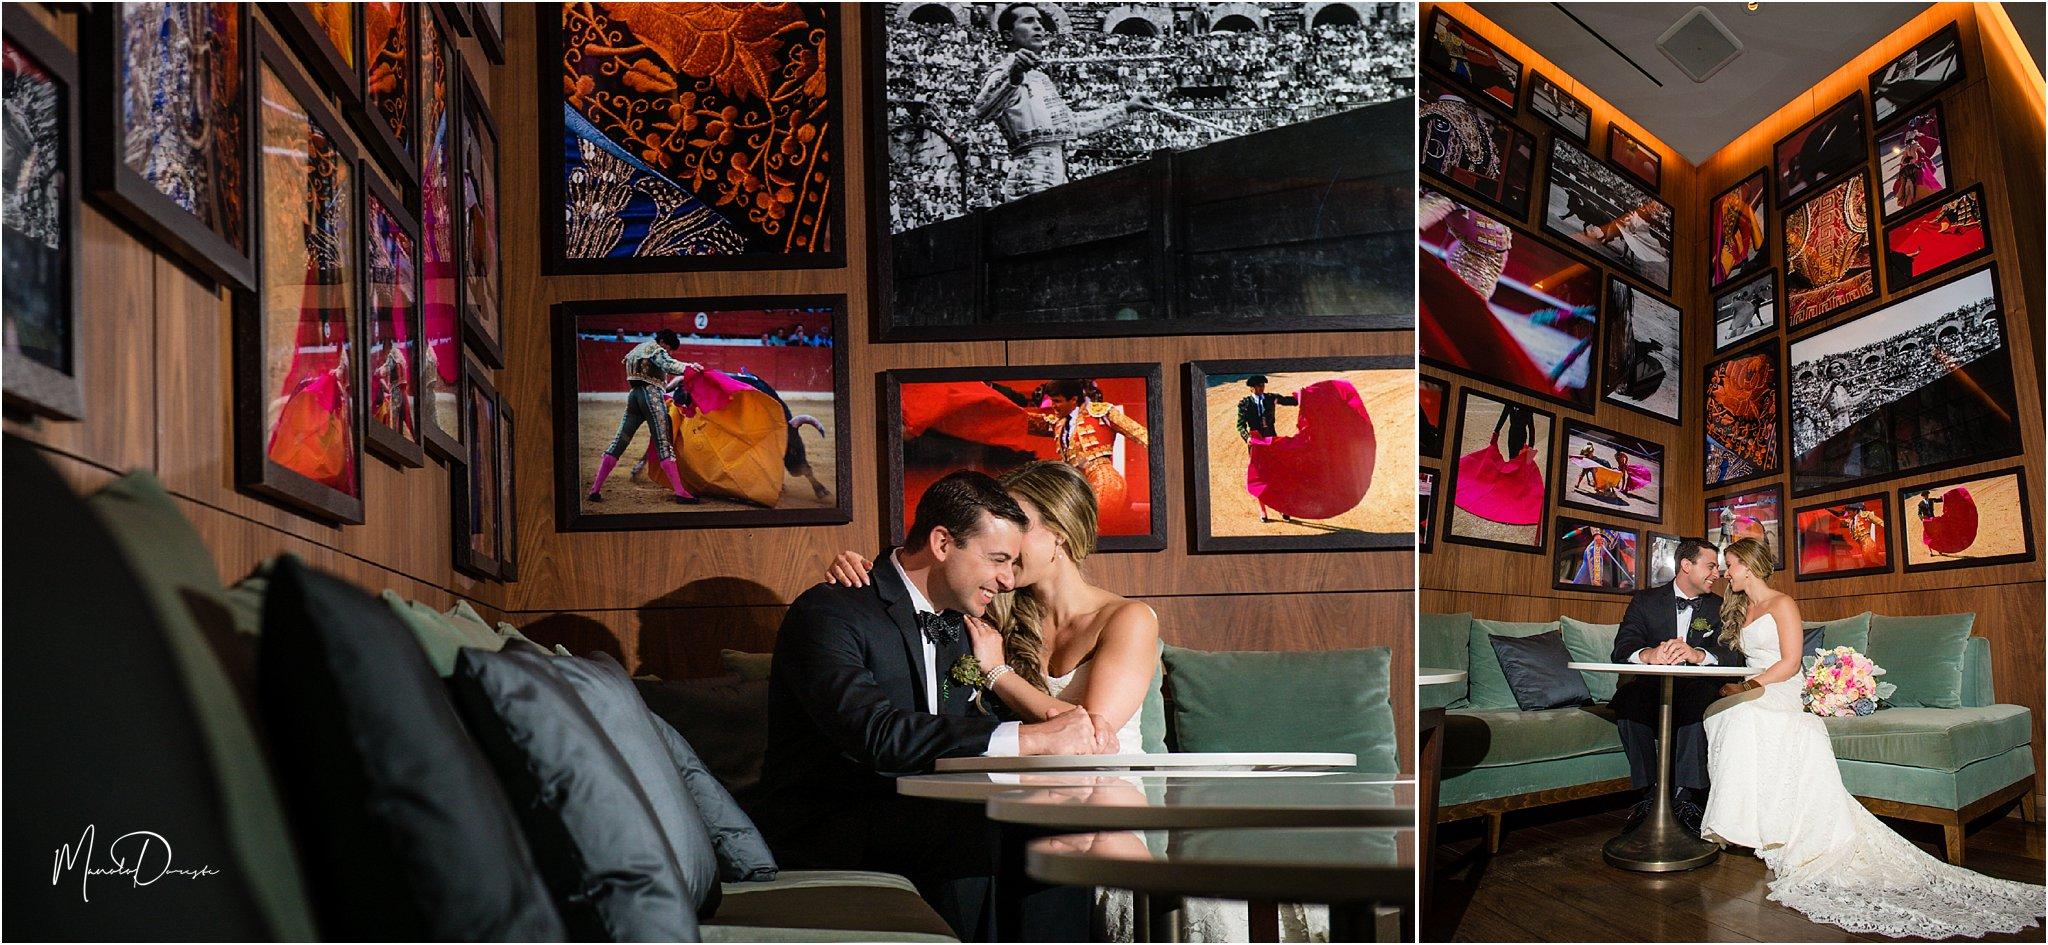 0665_ManoloDoreste_InFocusStudios_Wedding_Family_Photography_Miami_MiamiPhotographer.jpg